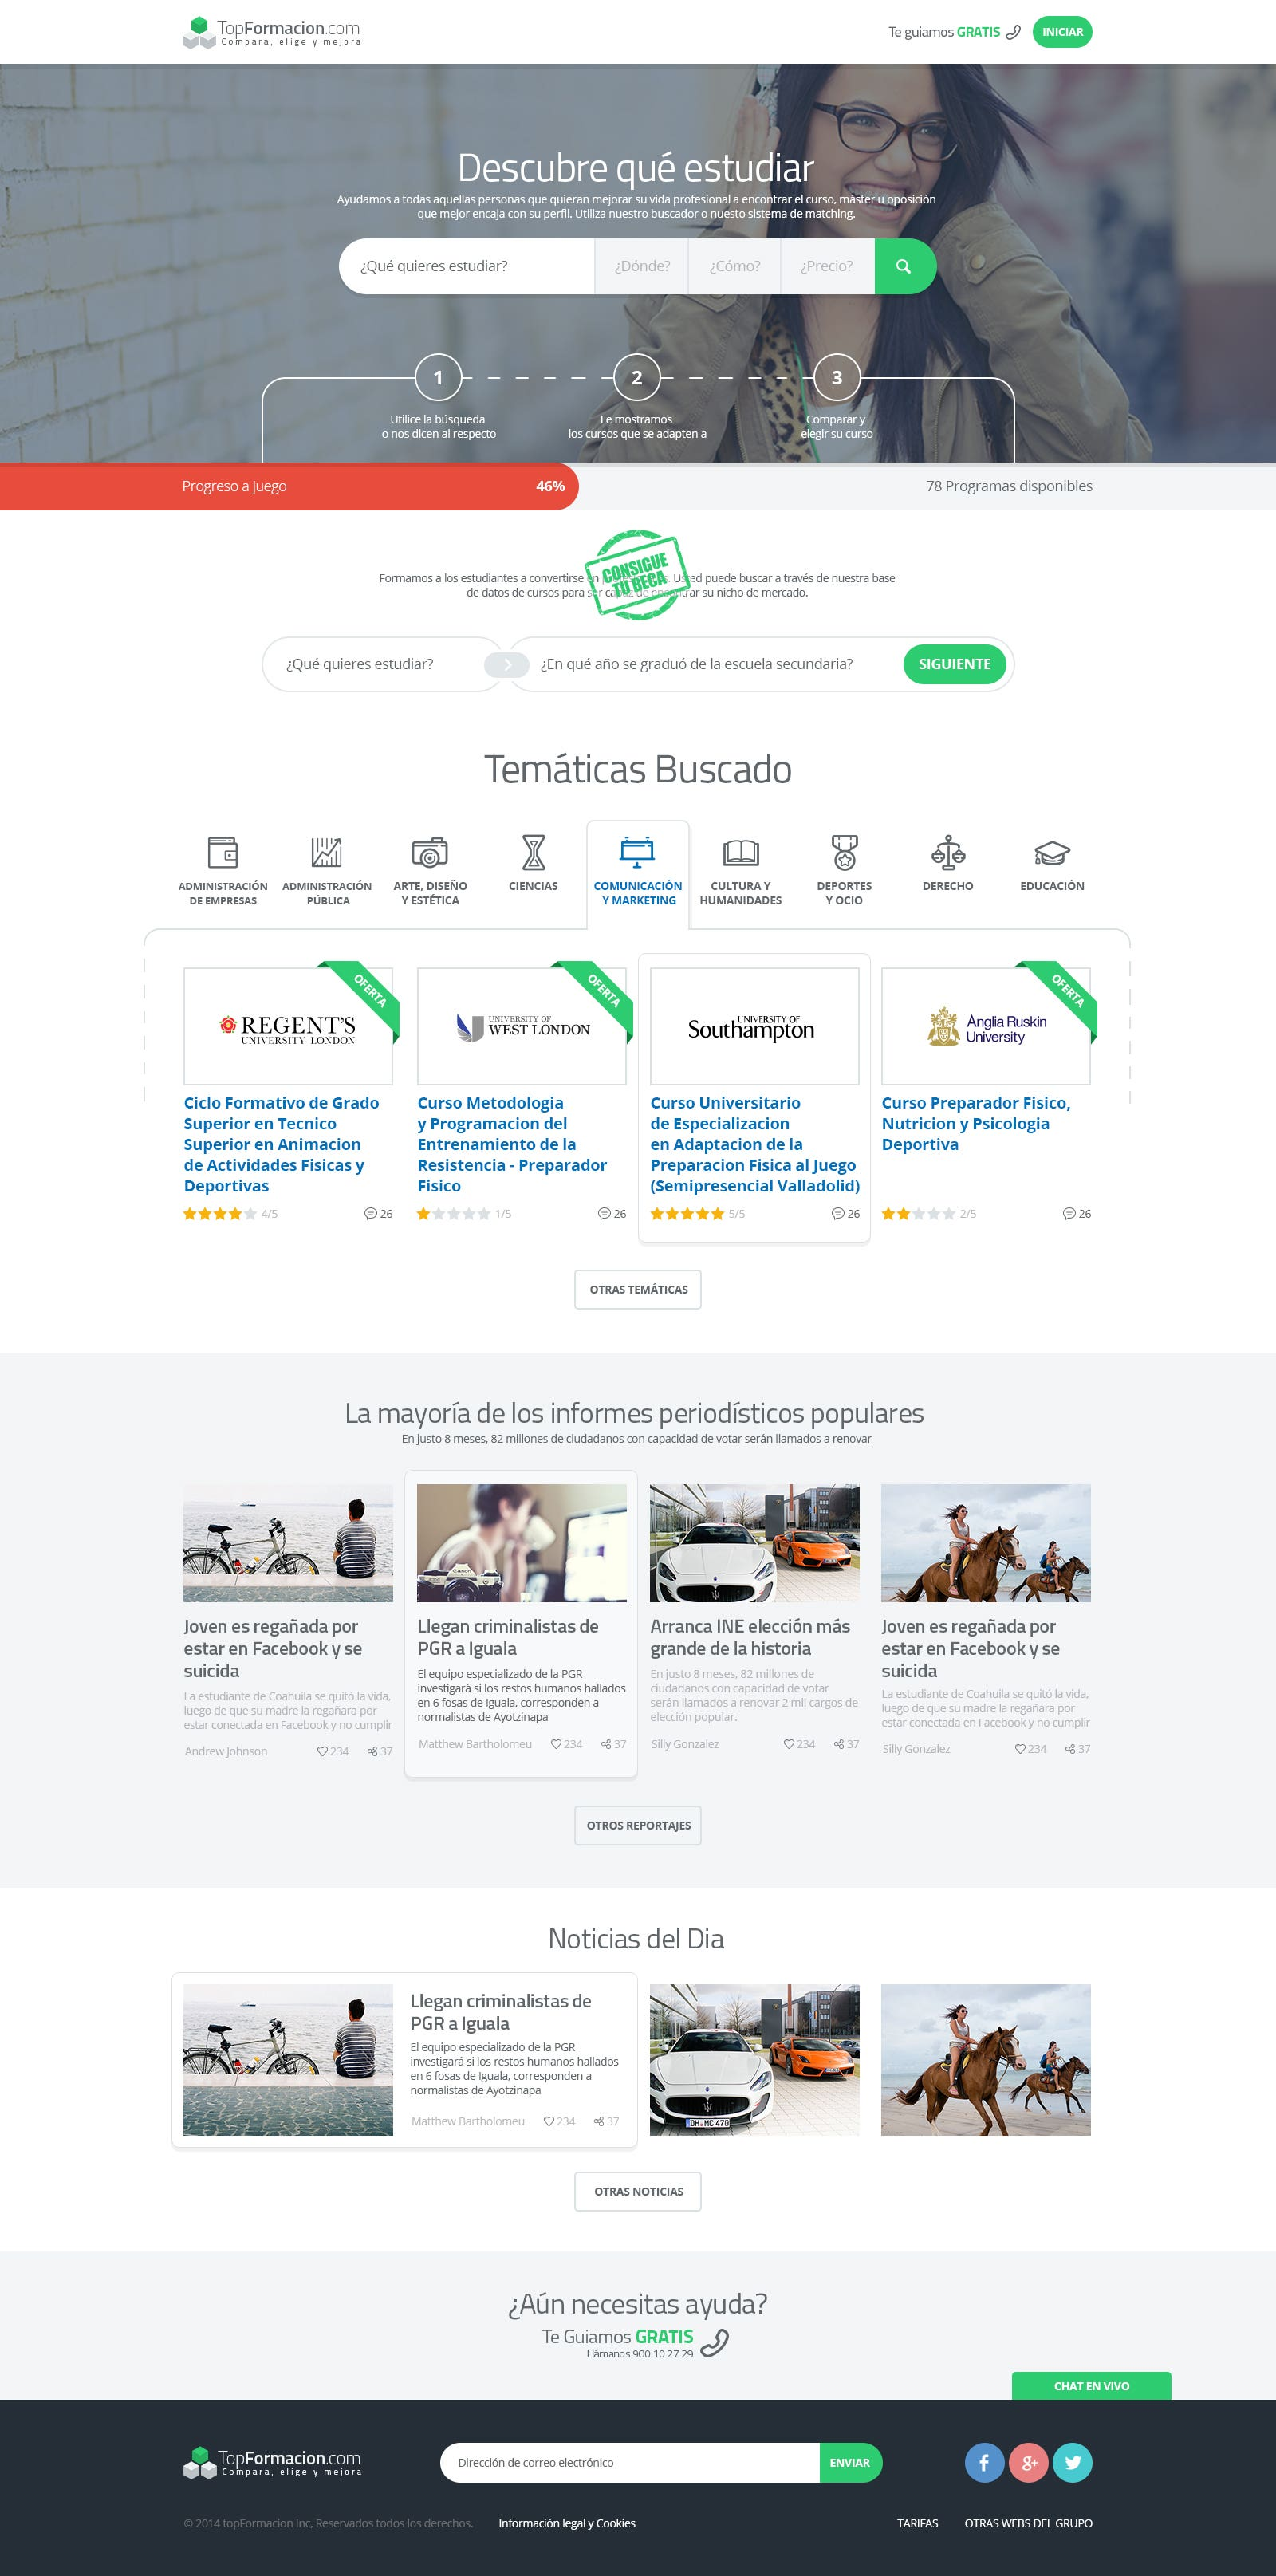 TopFormacion - Spanish website for courses